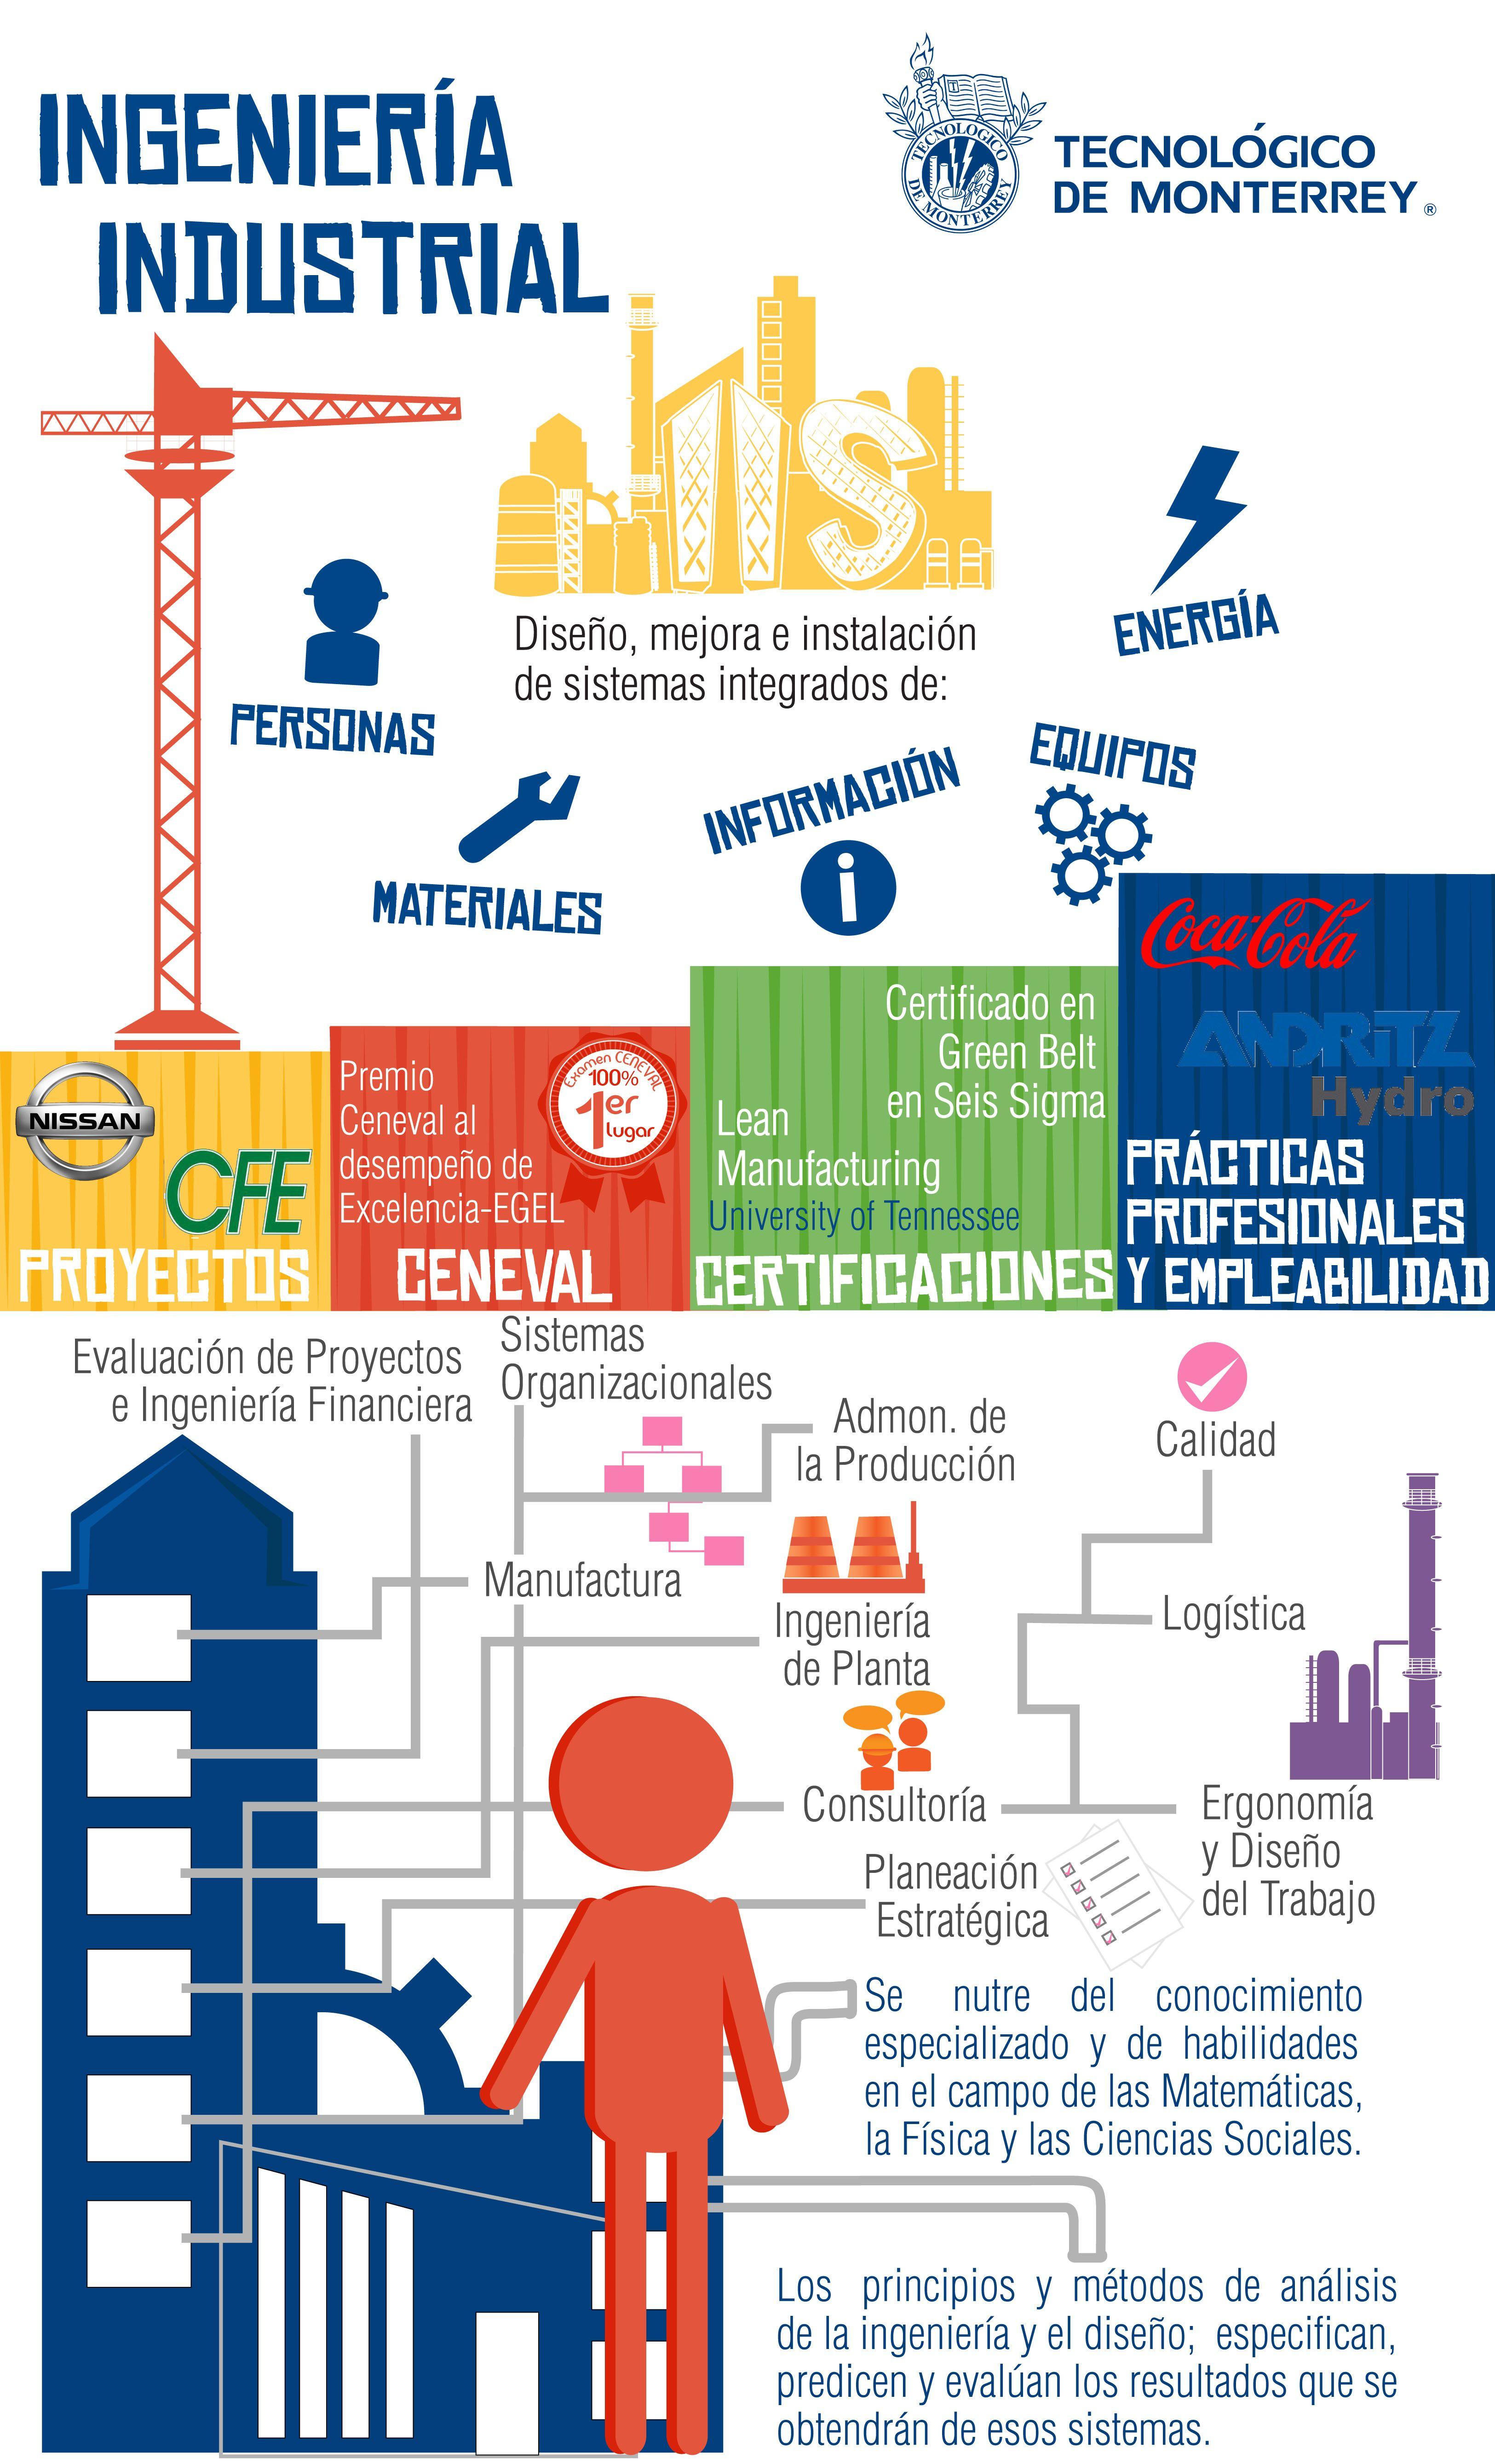 Ingeniería Industrial | Ingeniería | Pinterest | Industrial engineering